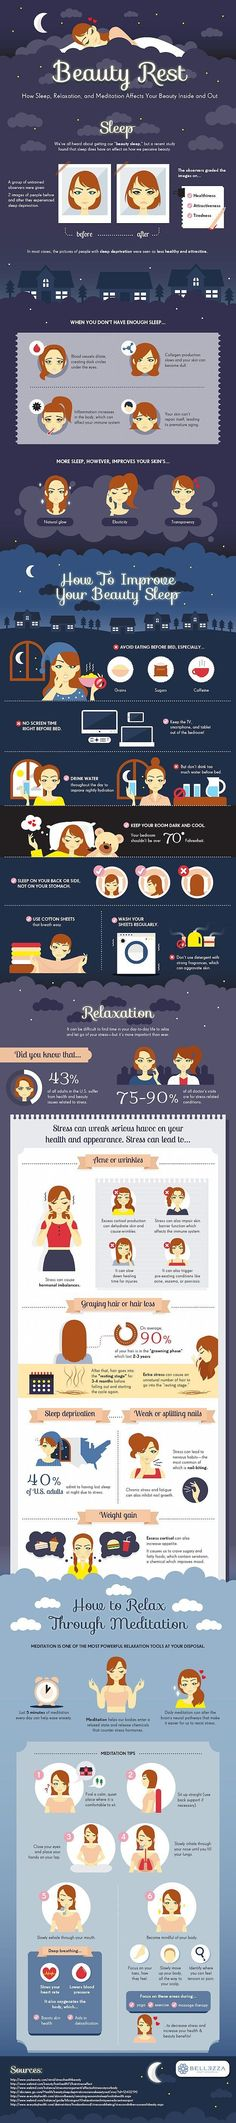 Tips to Improve Your Beauty Sleep, check it out at http://makeuptutorials.com/beauty-sleep-tips-makeup-tutorials